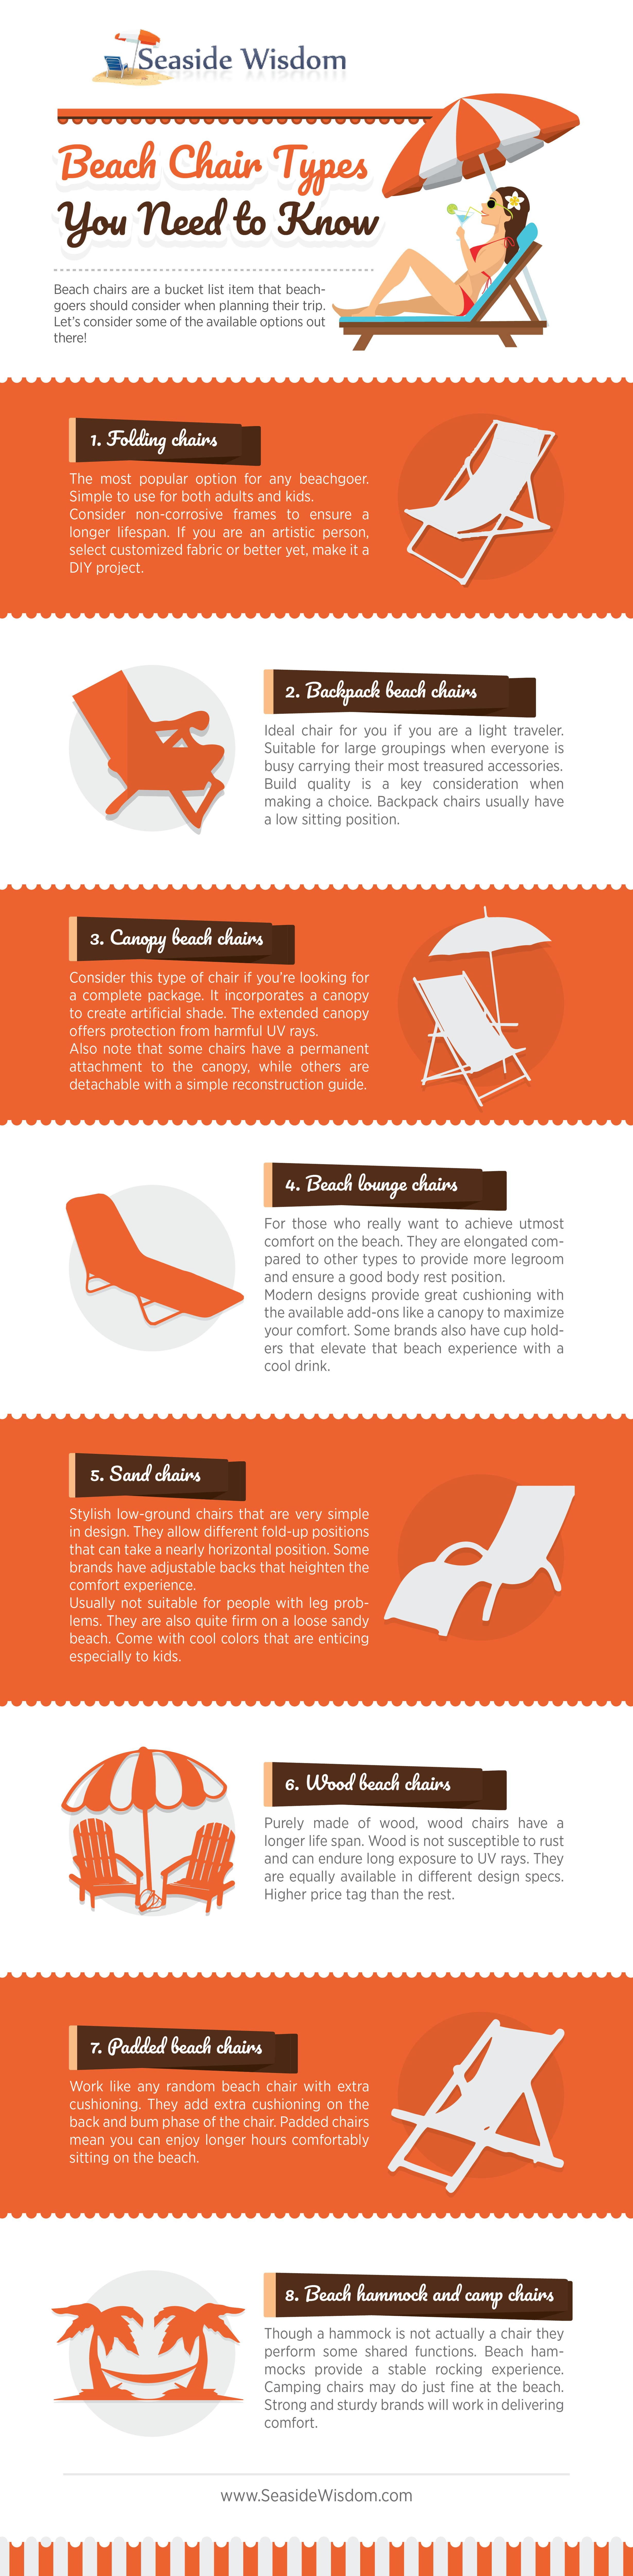 Types Of Beach Chairs Seaside Wisdom Beach Chairs